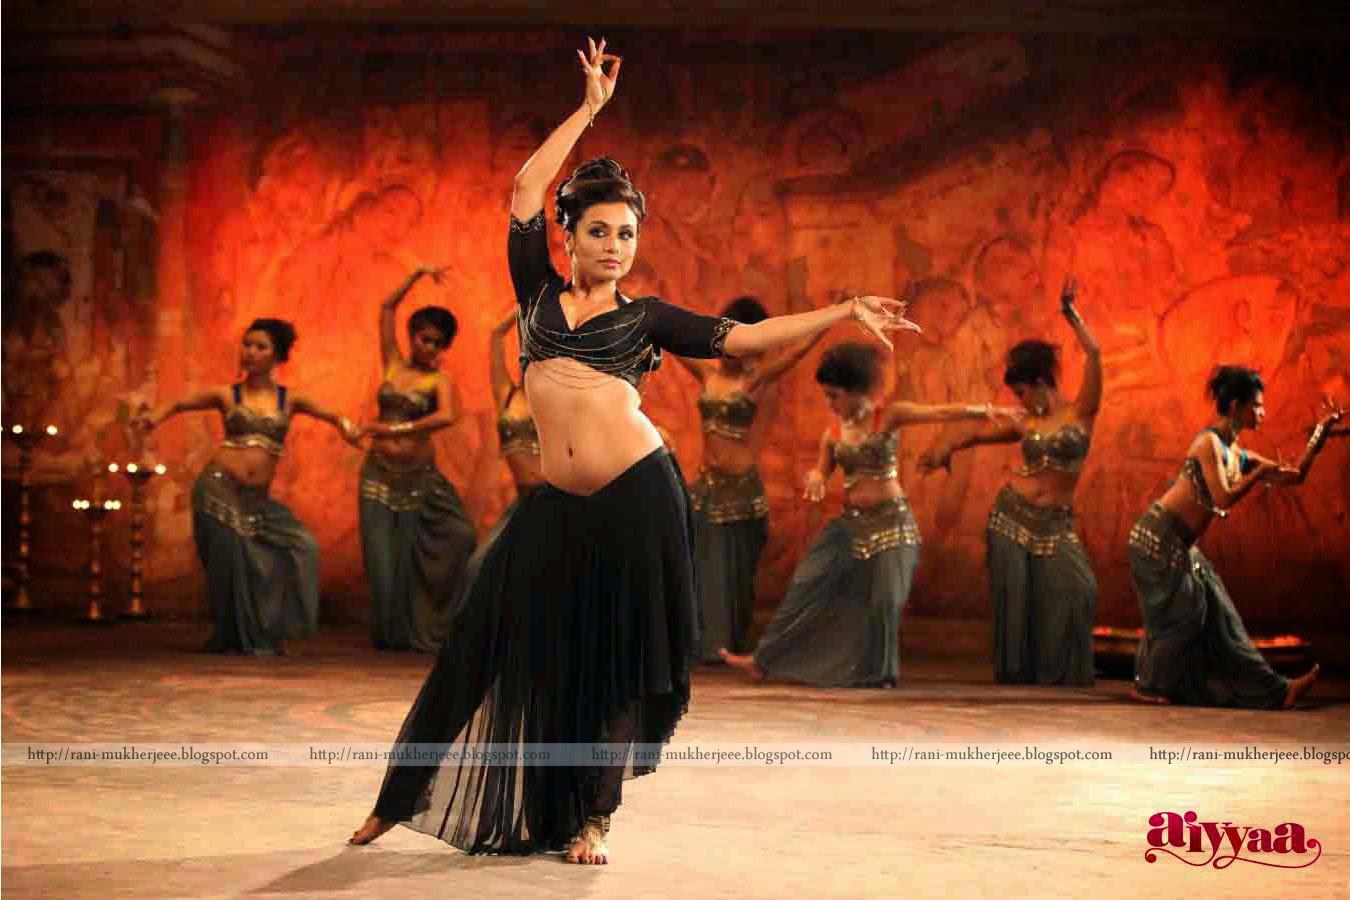 Rani Mukherjee Rani Mukherjee Navel Pics In Aiyyaa-4896